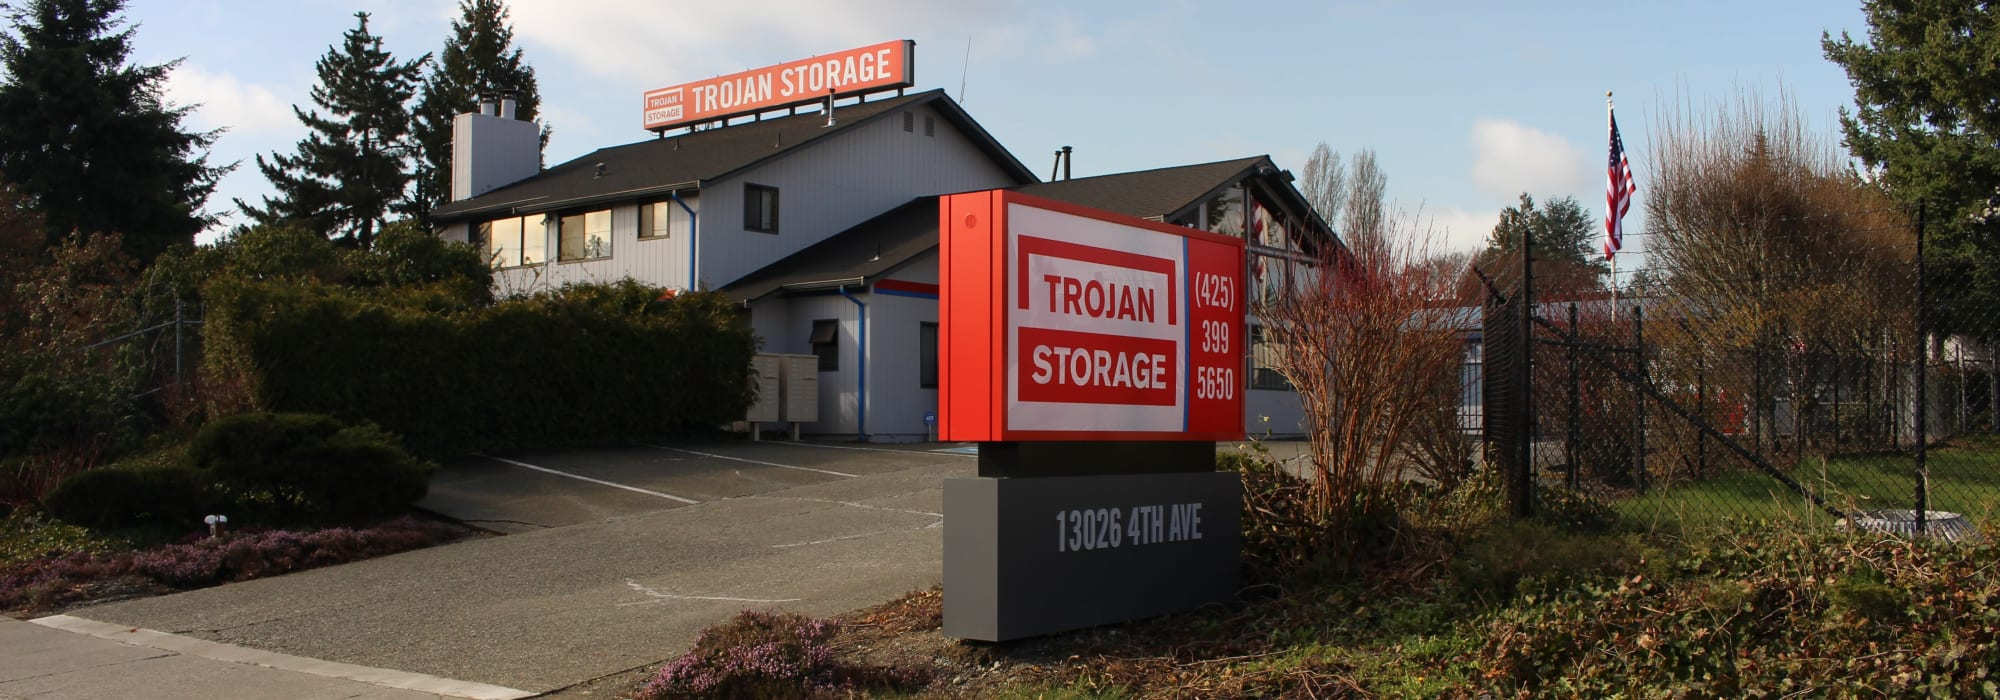 Self storage in Everett, Washington